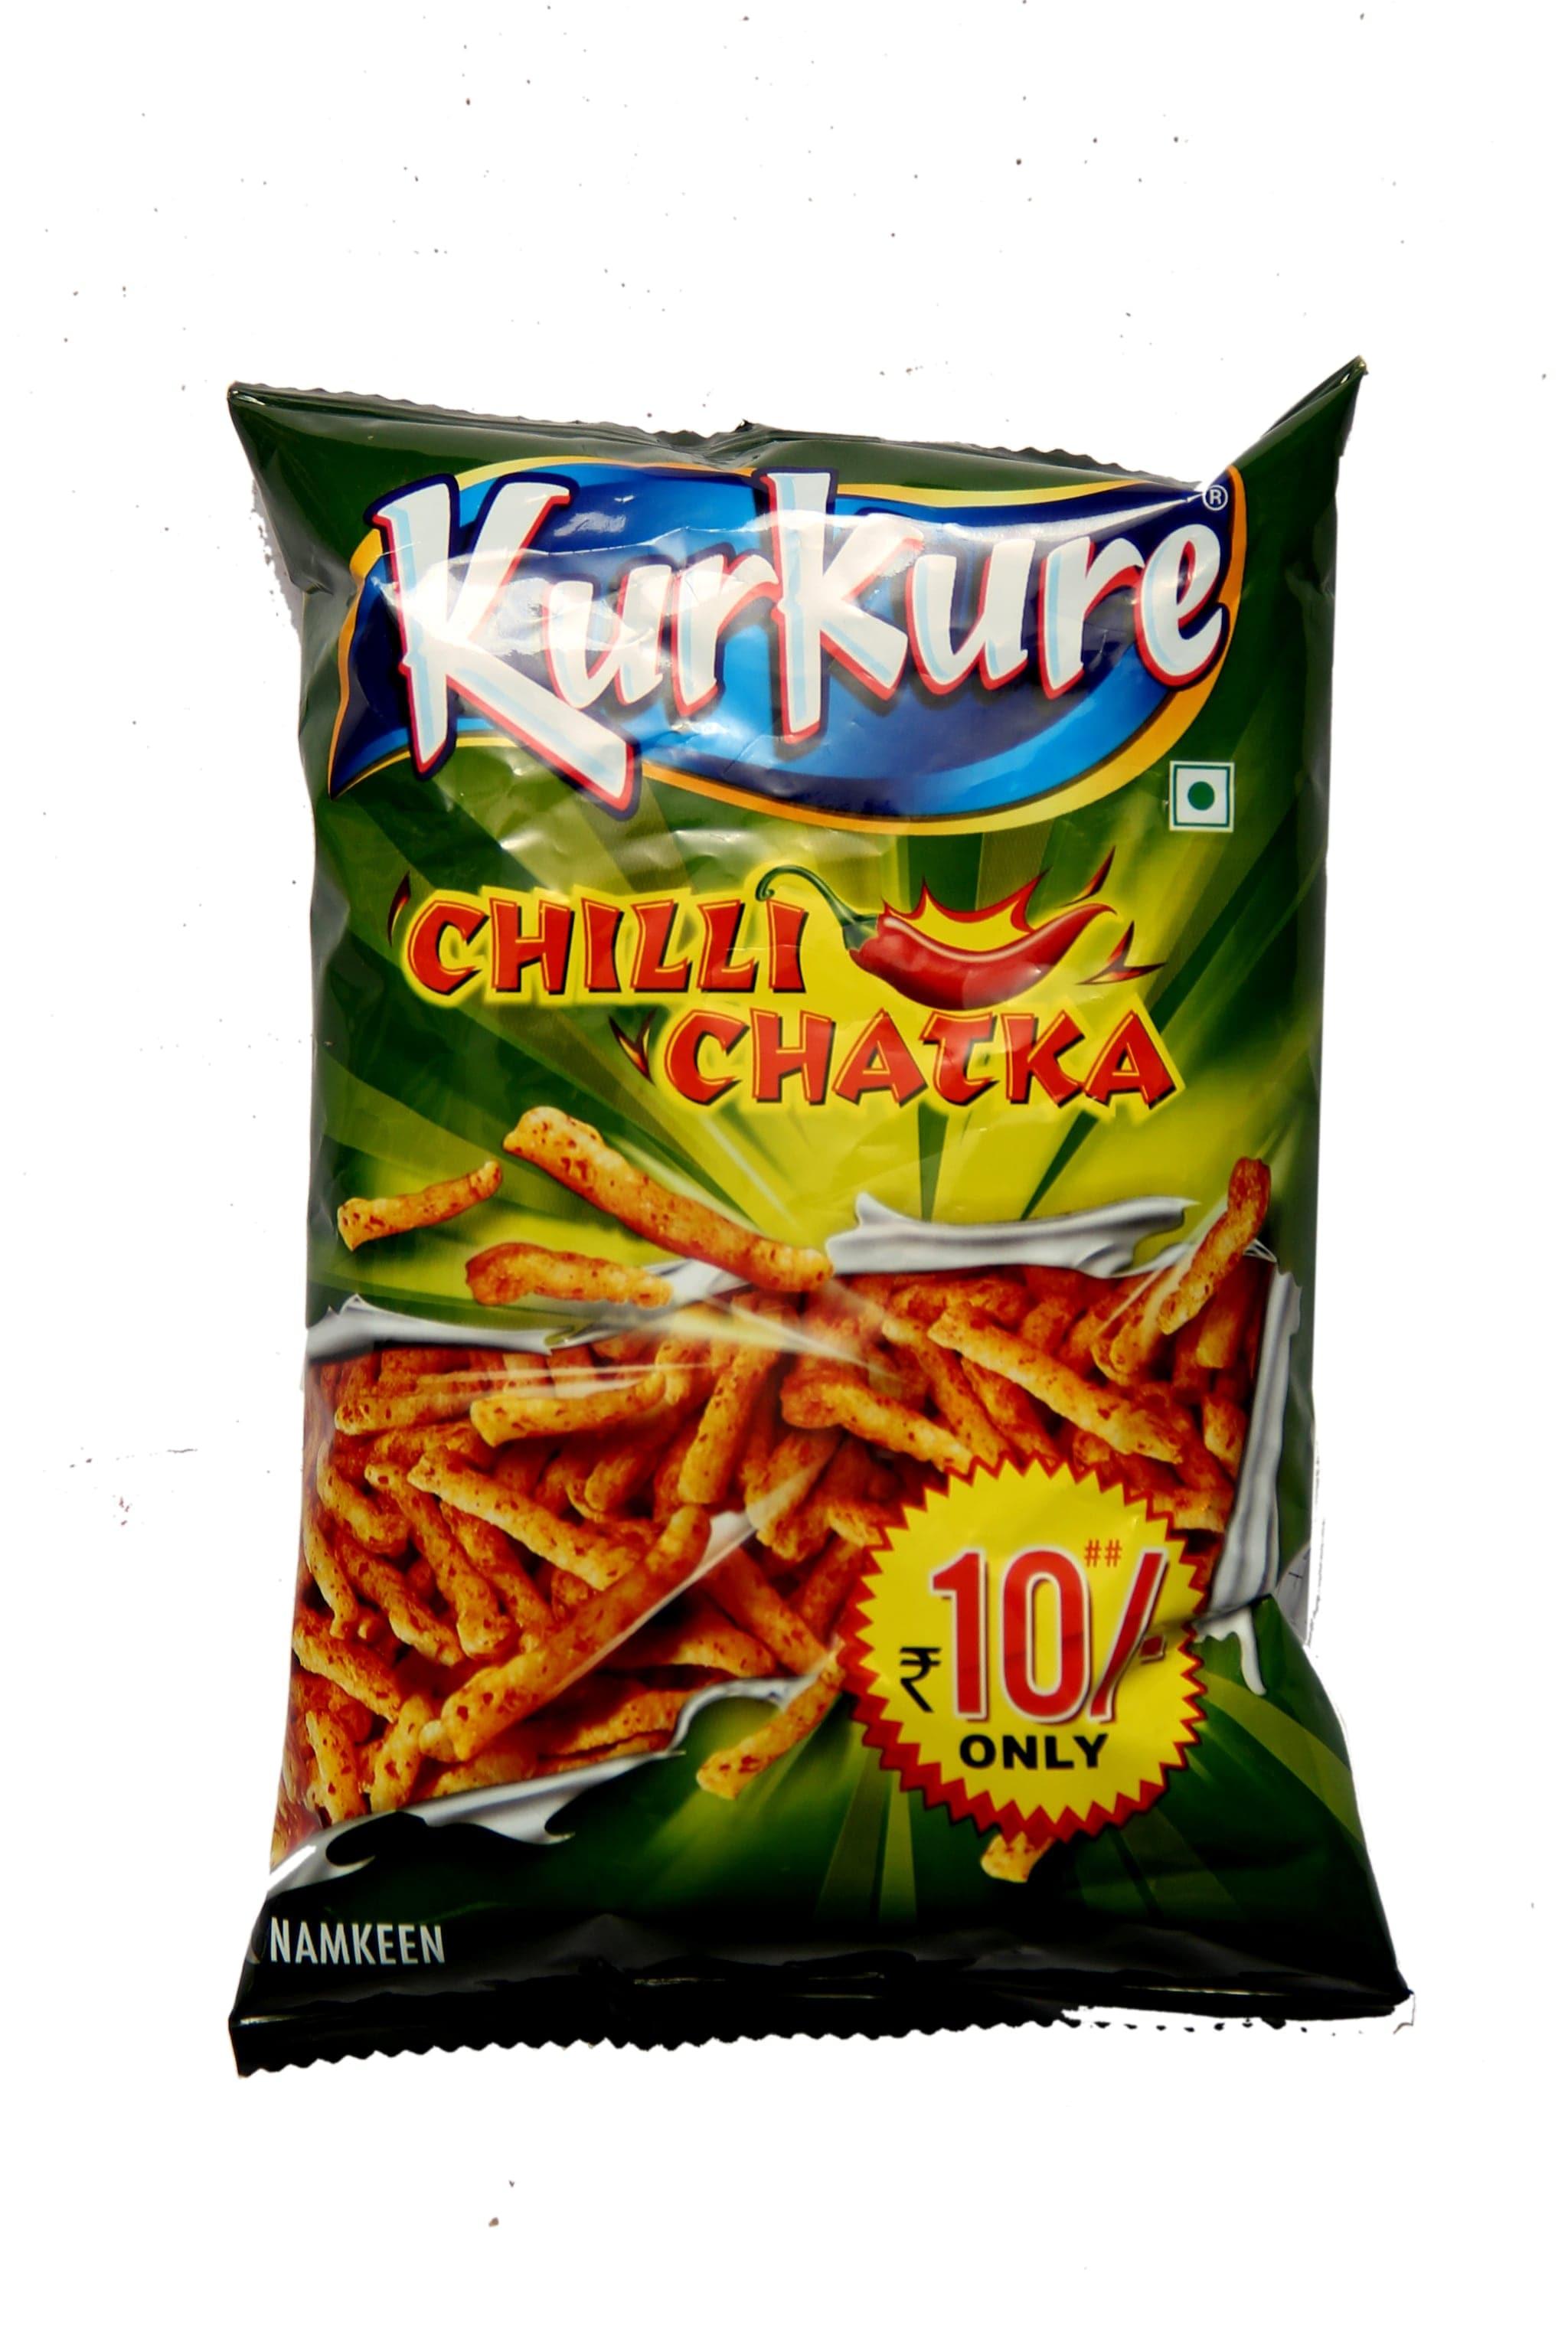 KurKure Chilli Chatka - 47 Gm 45 Gm